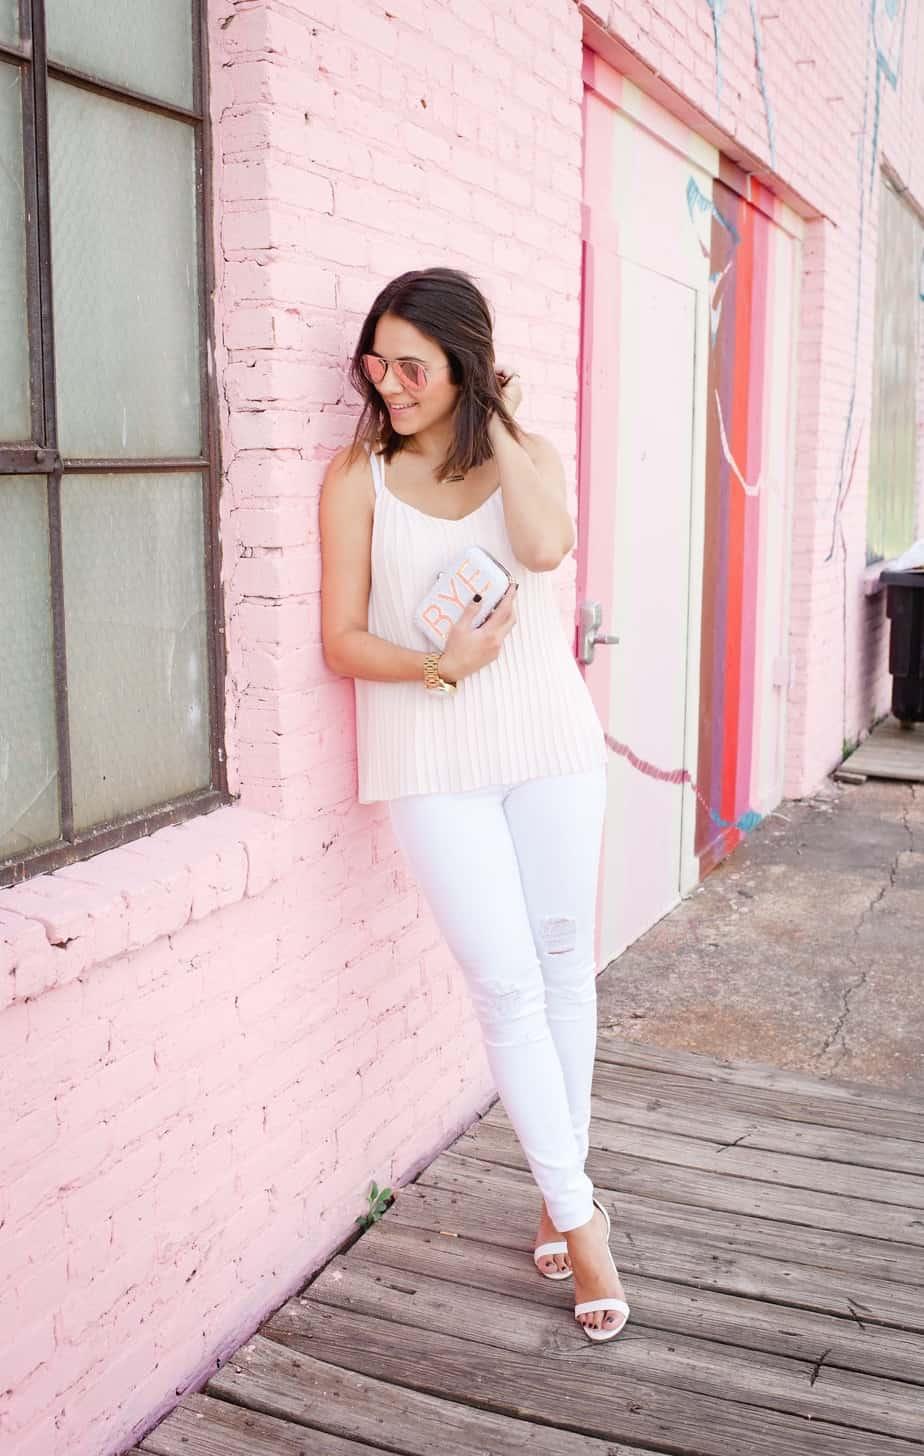 Express pleated blush top and white jeans via @mystylevita [My Style Vita] - 1 (1)